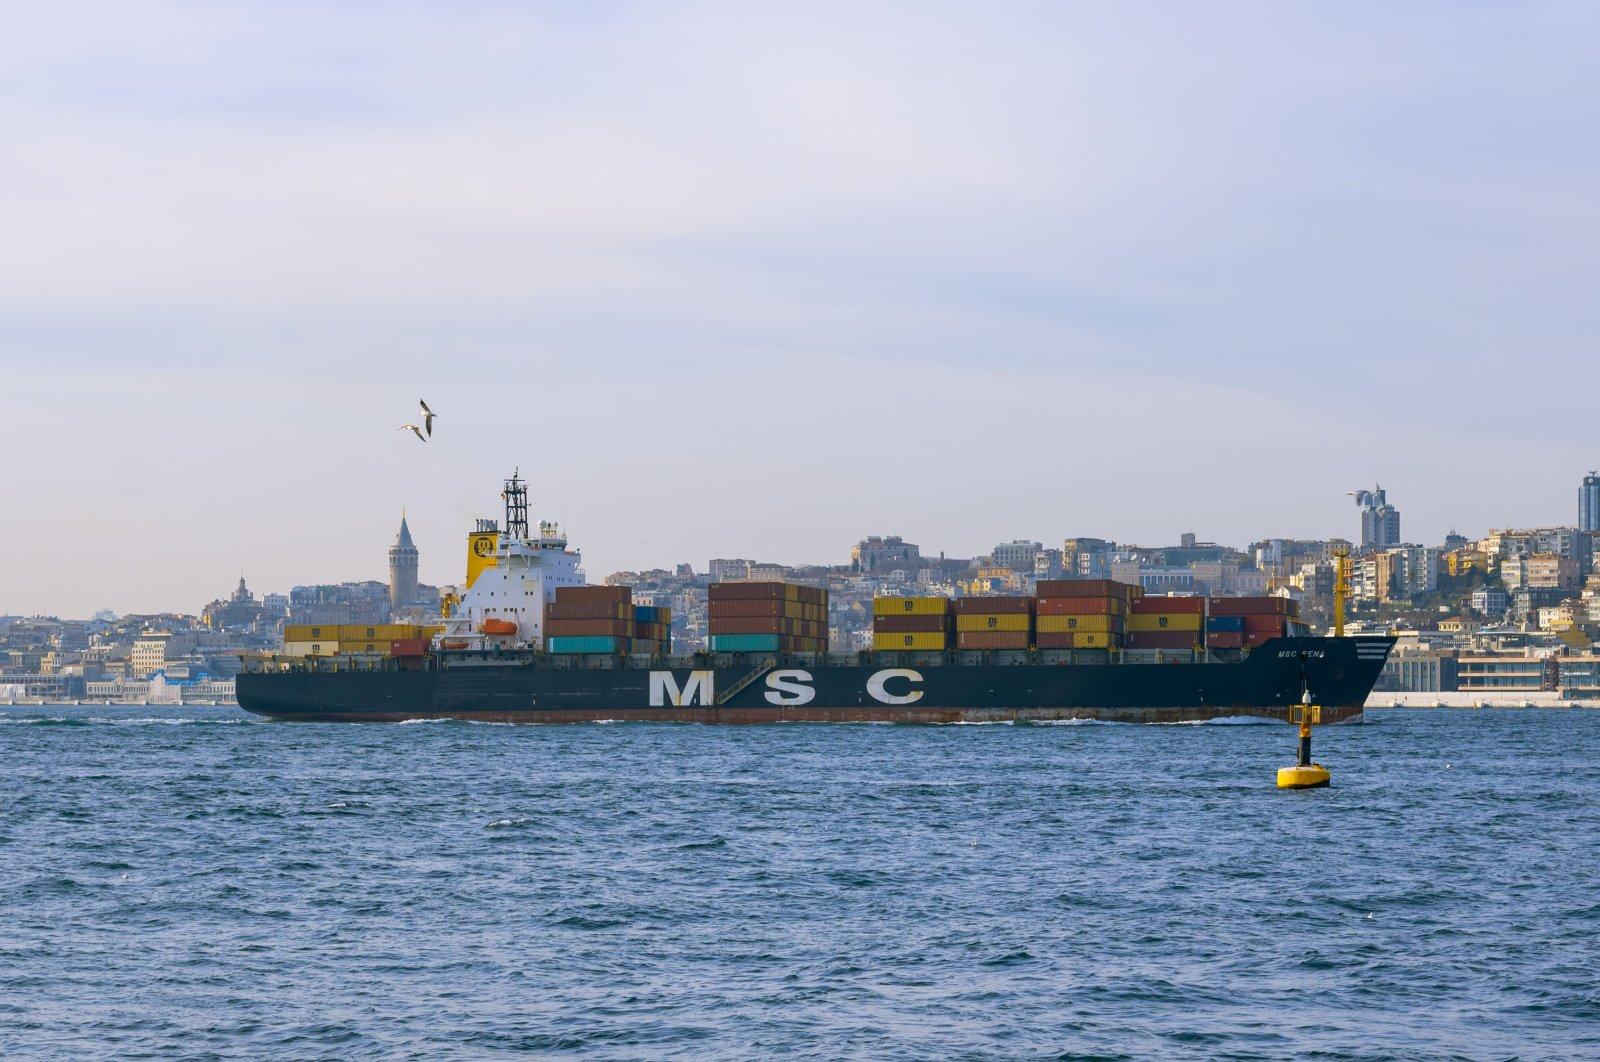 A container ship sails through the Bosporus in Istanbul, Turkey, Dec. 25, 2020. (Shutterstock Photo)